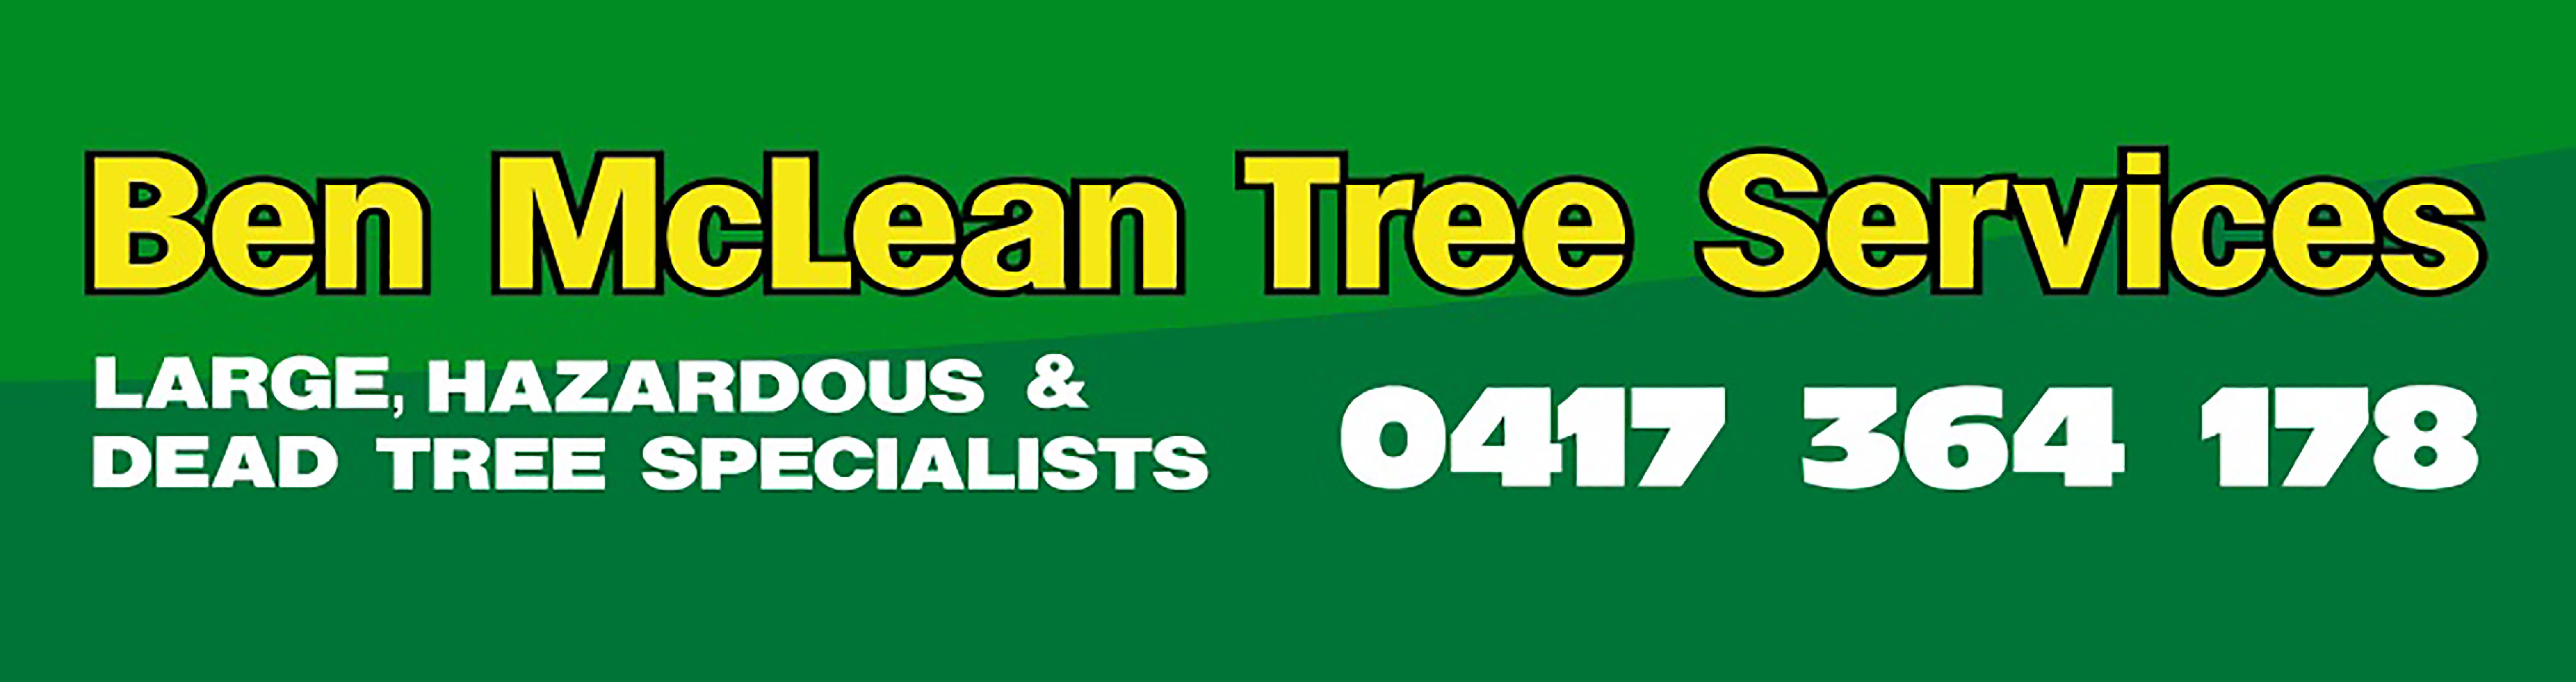 ben mclean tree services